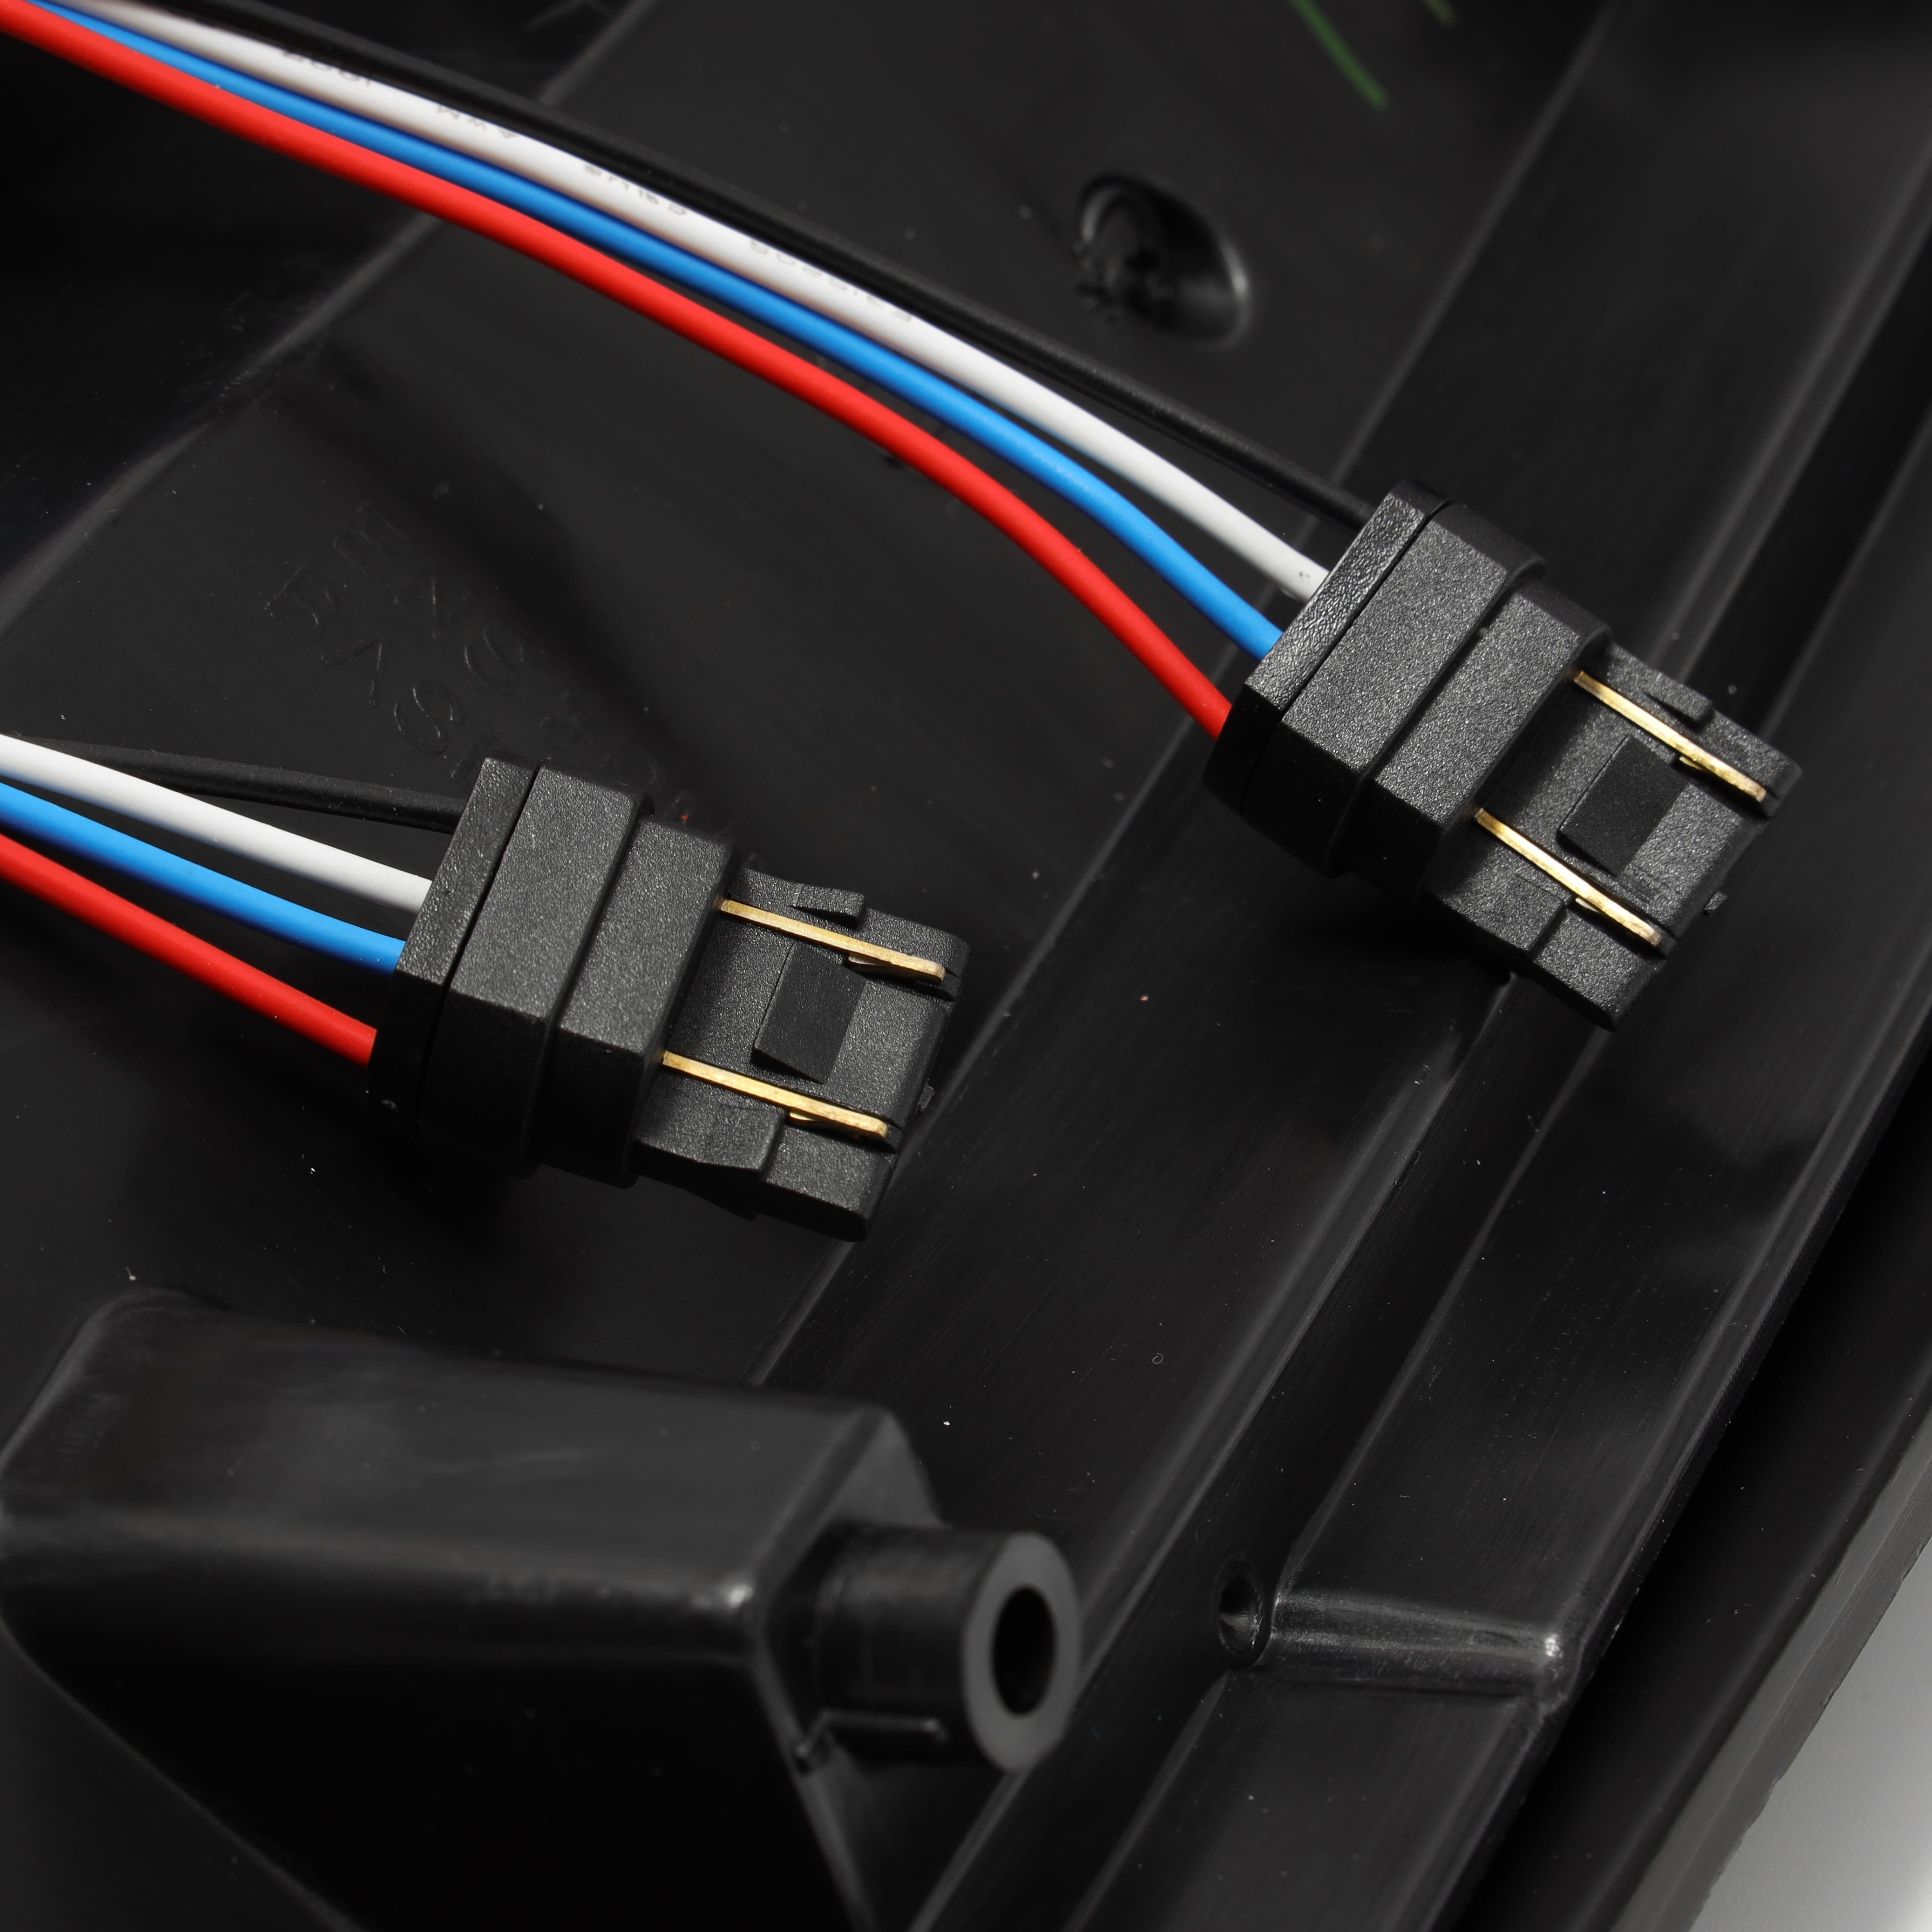 2014 2015 2016 2017 2018 Chevrolet Silverado 1500/2500HD/3500HD / GMC Sierra 3500HD Dually PRO-Series LED Tail Lights Red Smoke